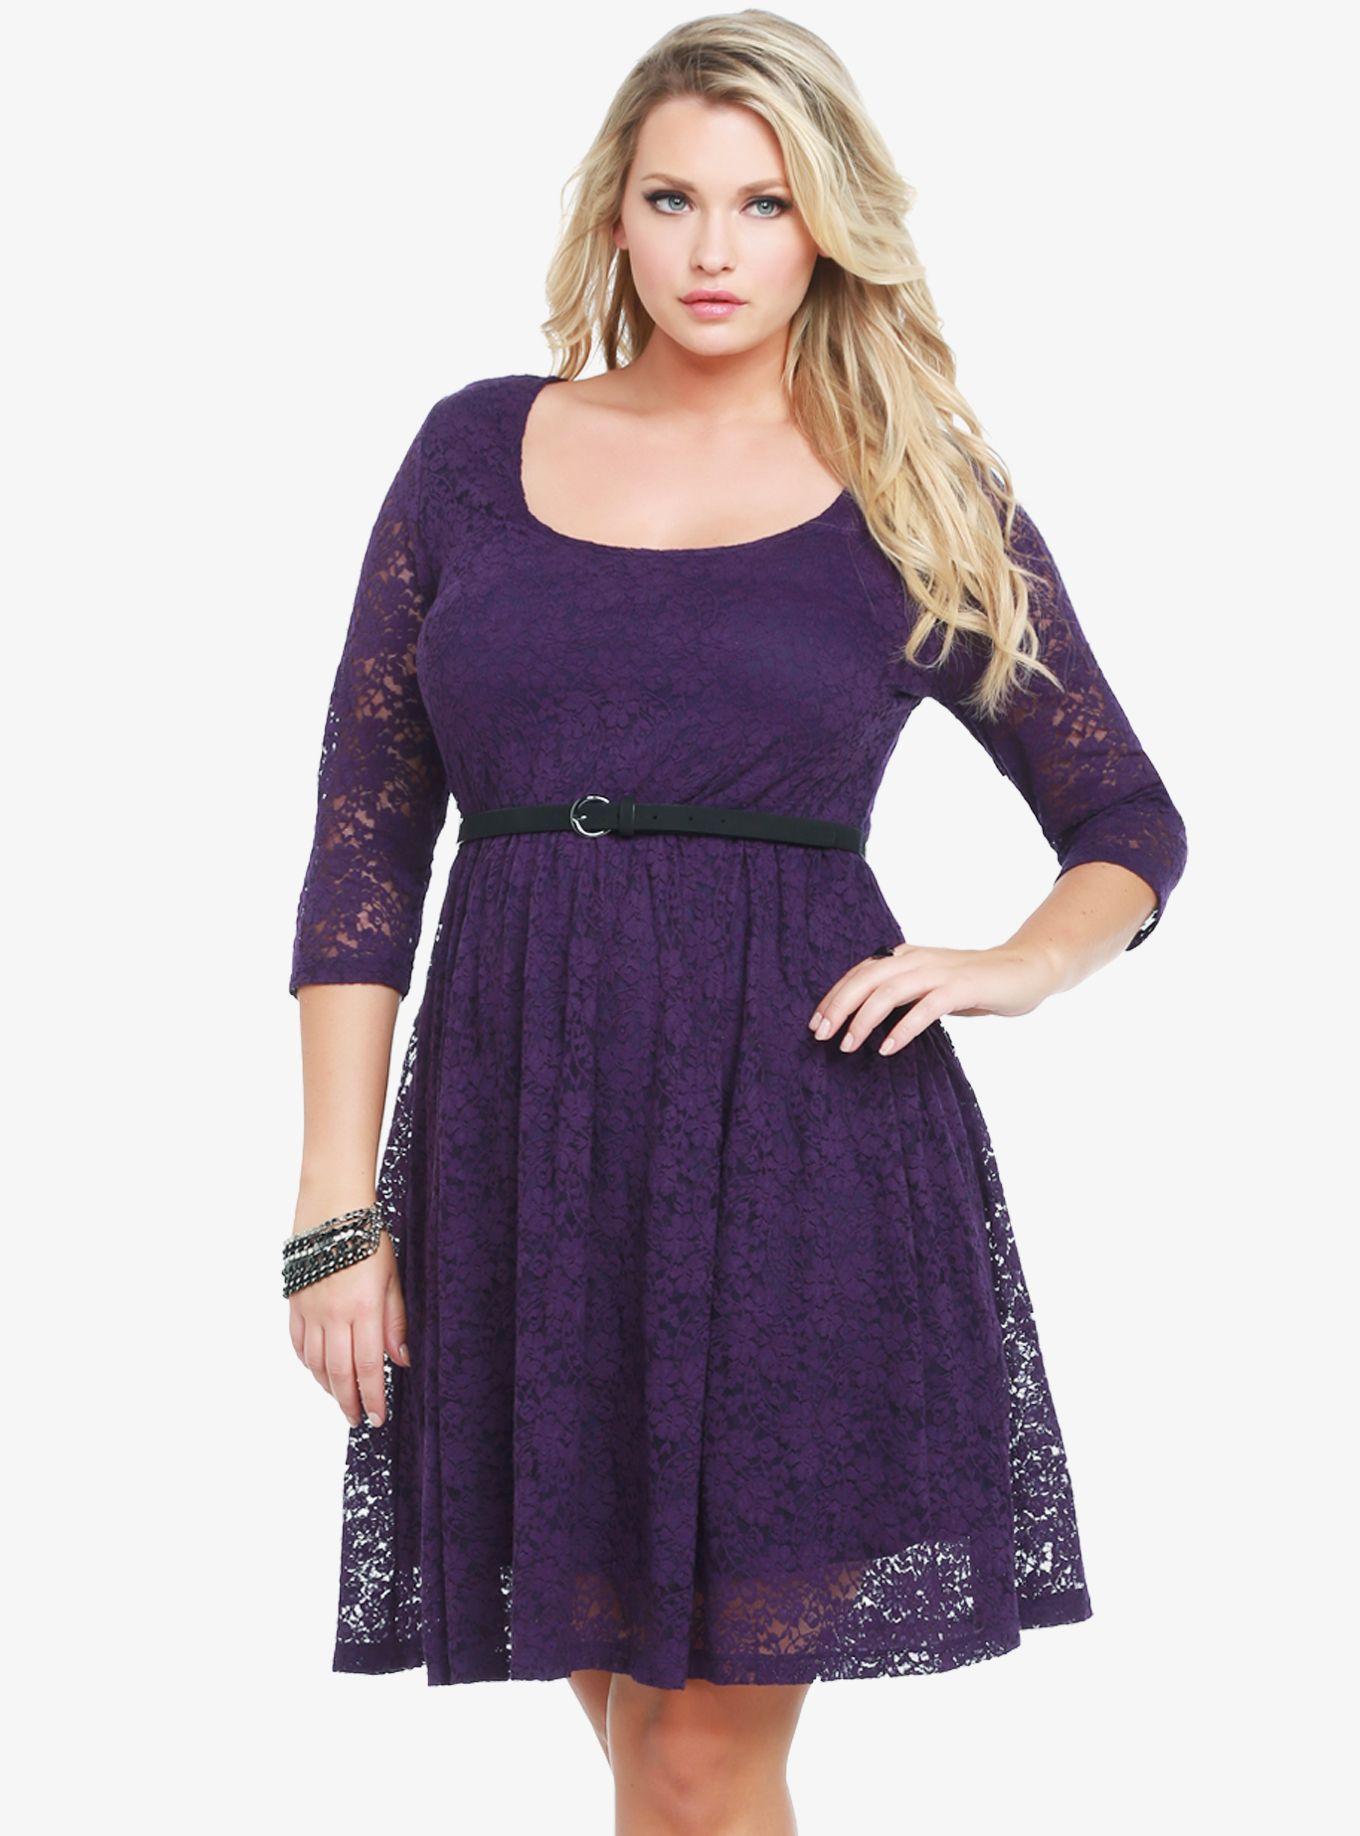 Dress size 24 torrid dress 24 torrid black and white draped v neck - Lace Scoop Neck Belted Dress Torrid I Love This So